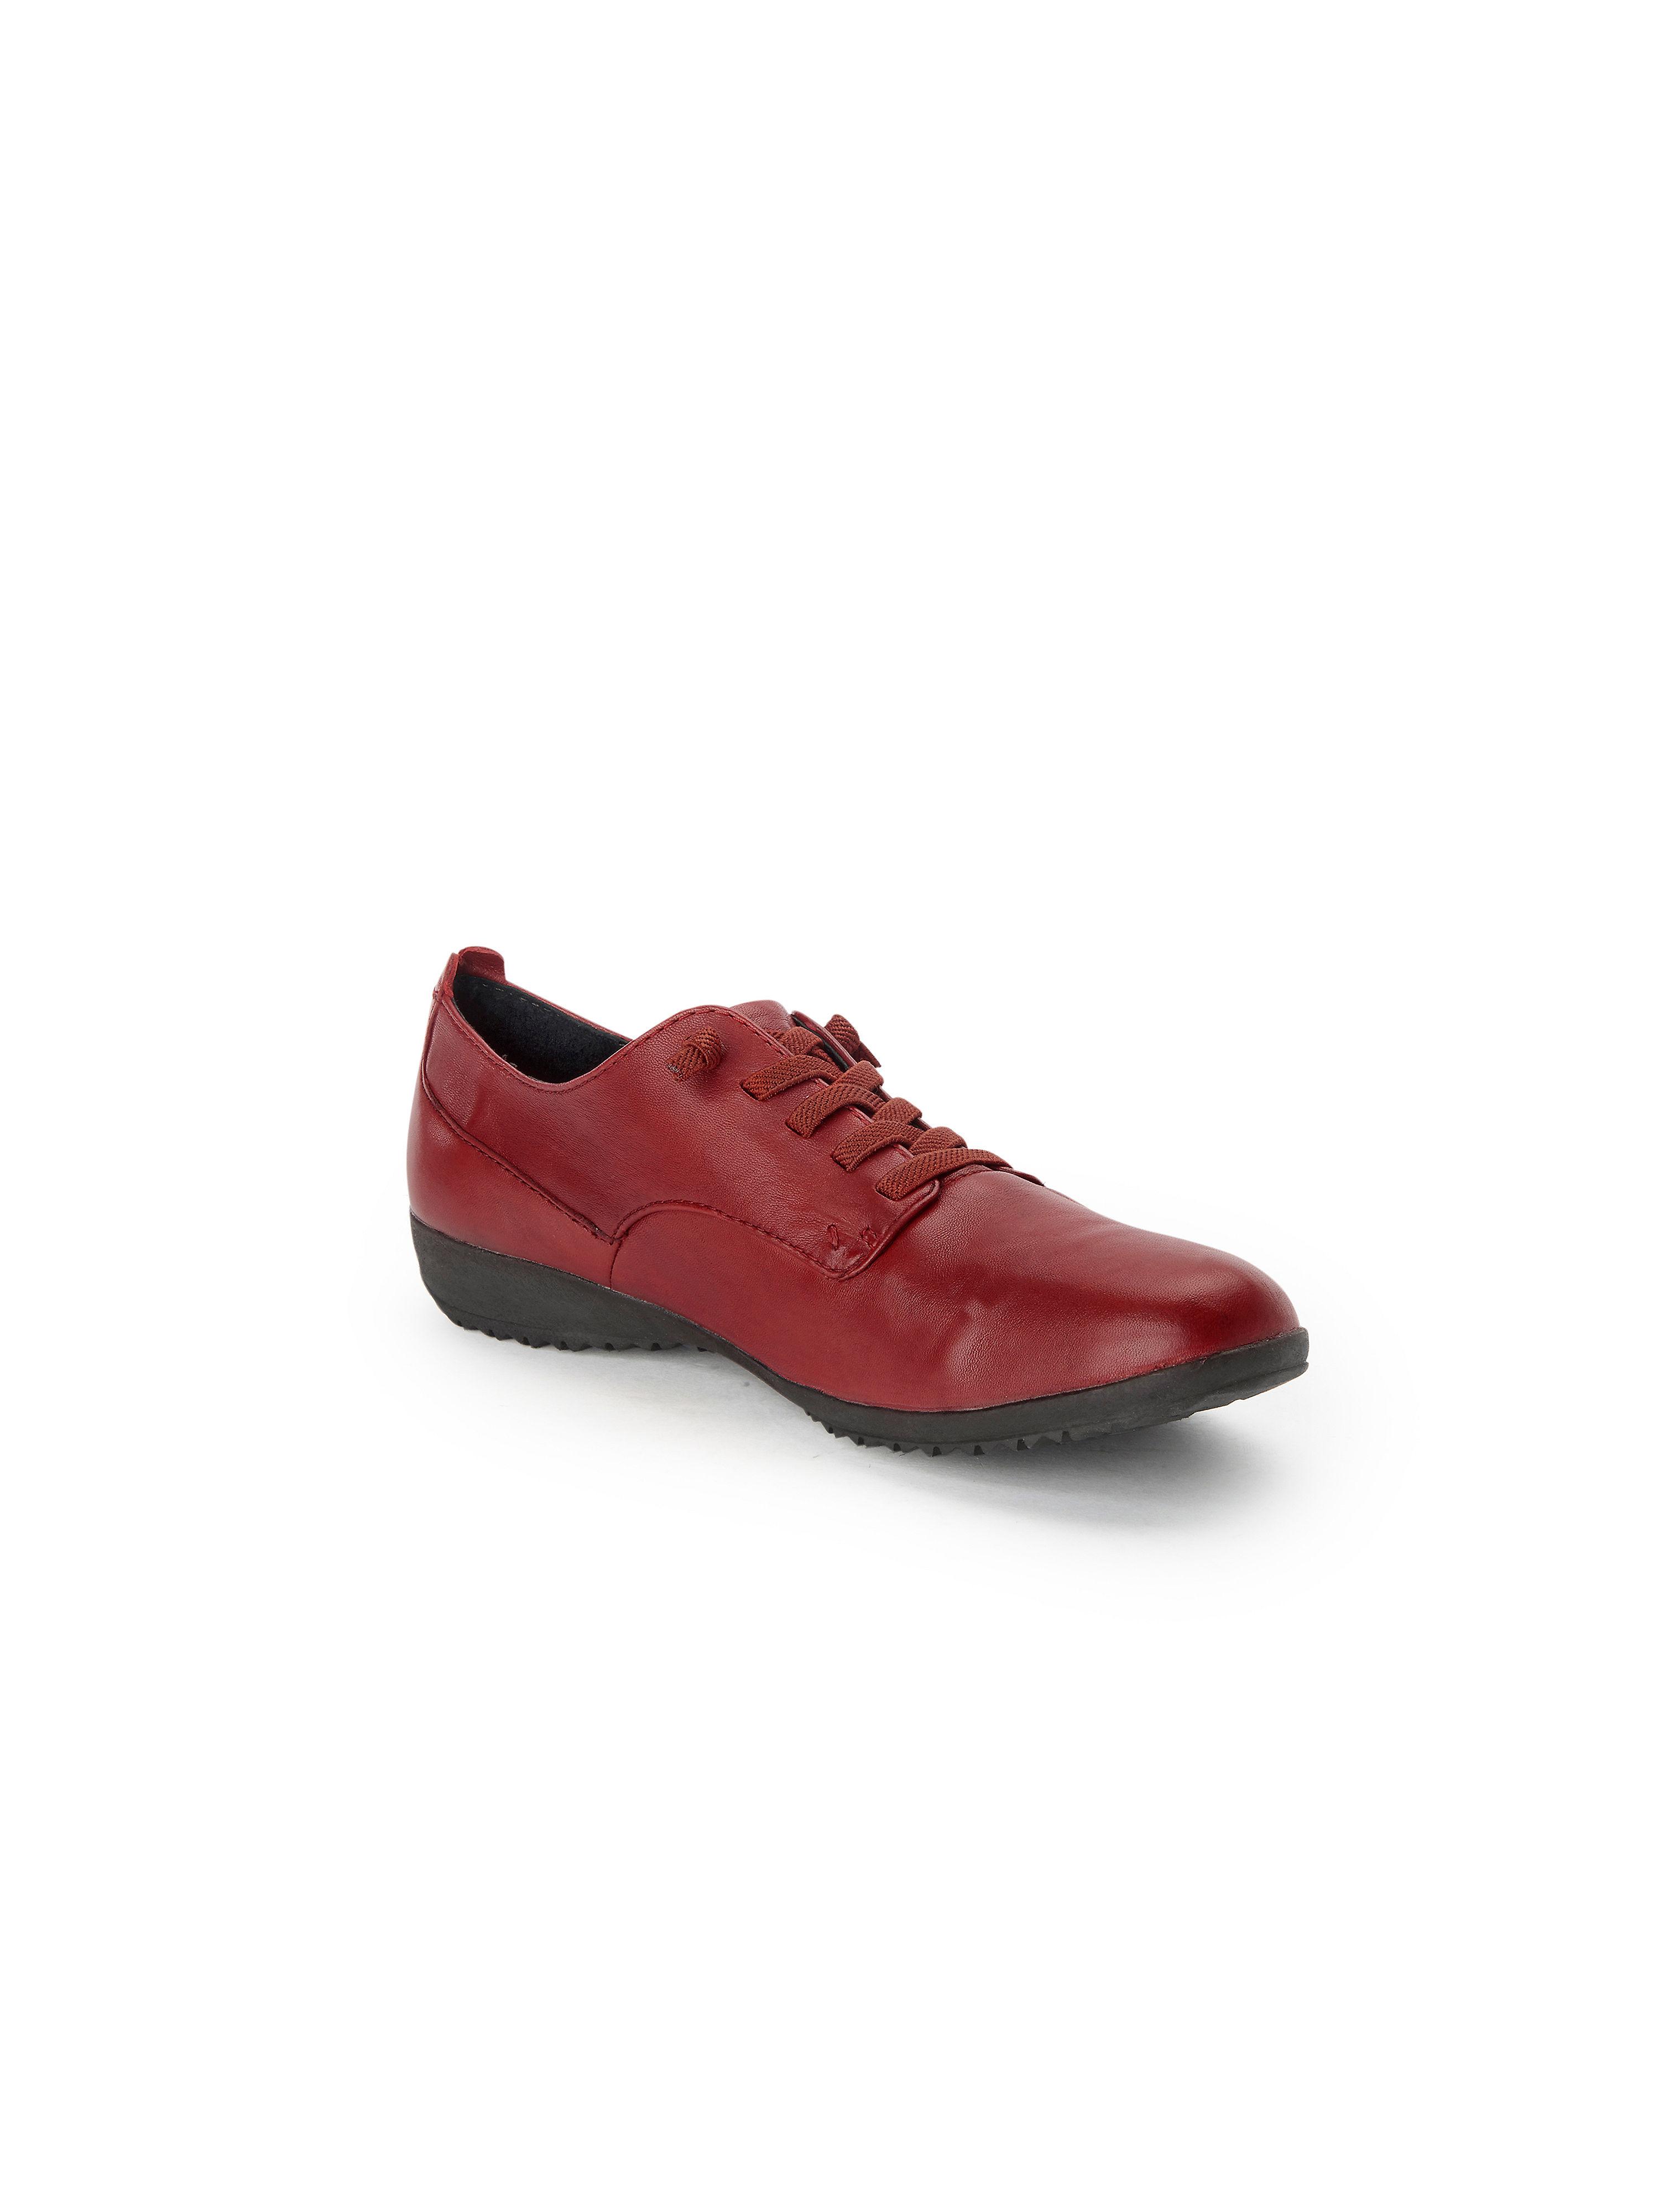 Josef Seibel - Supersofter Schnürer aus 100% Leder - Rot Gute Qualität beliebte Schuhe